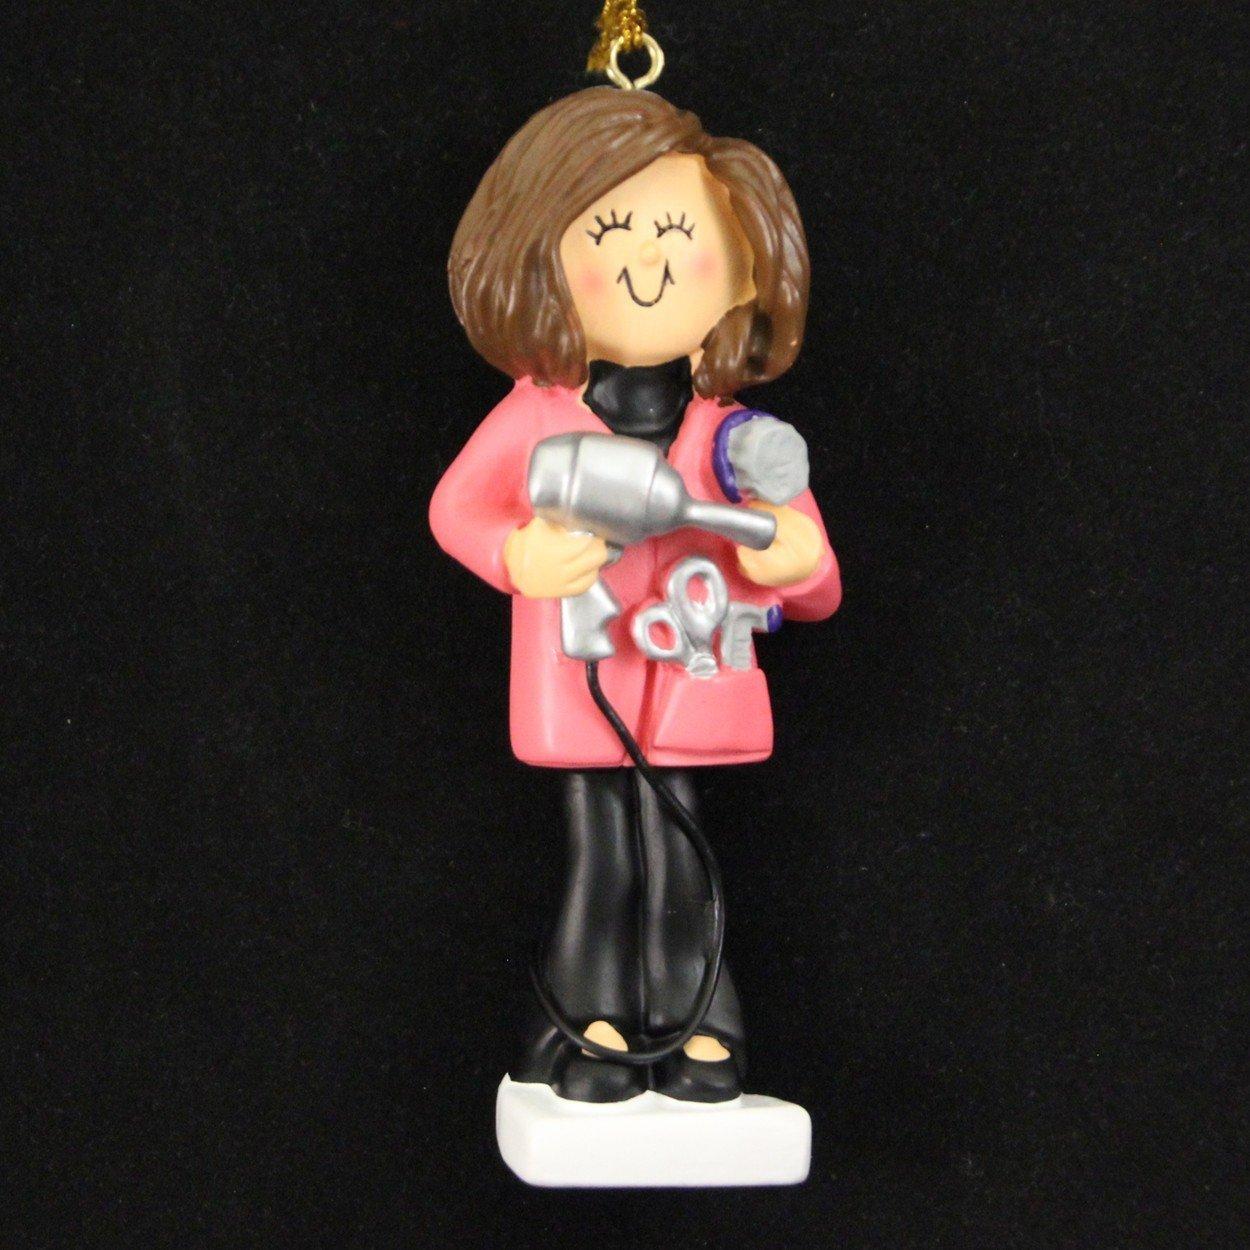 Hair stylist christmas ornaments - Amazon Com Ornament Central Oc 014 Fbr Hairdresser Ornament Home Kitchen